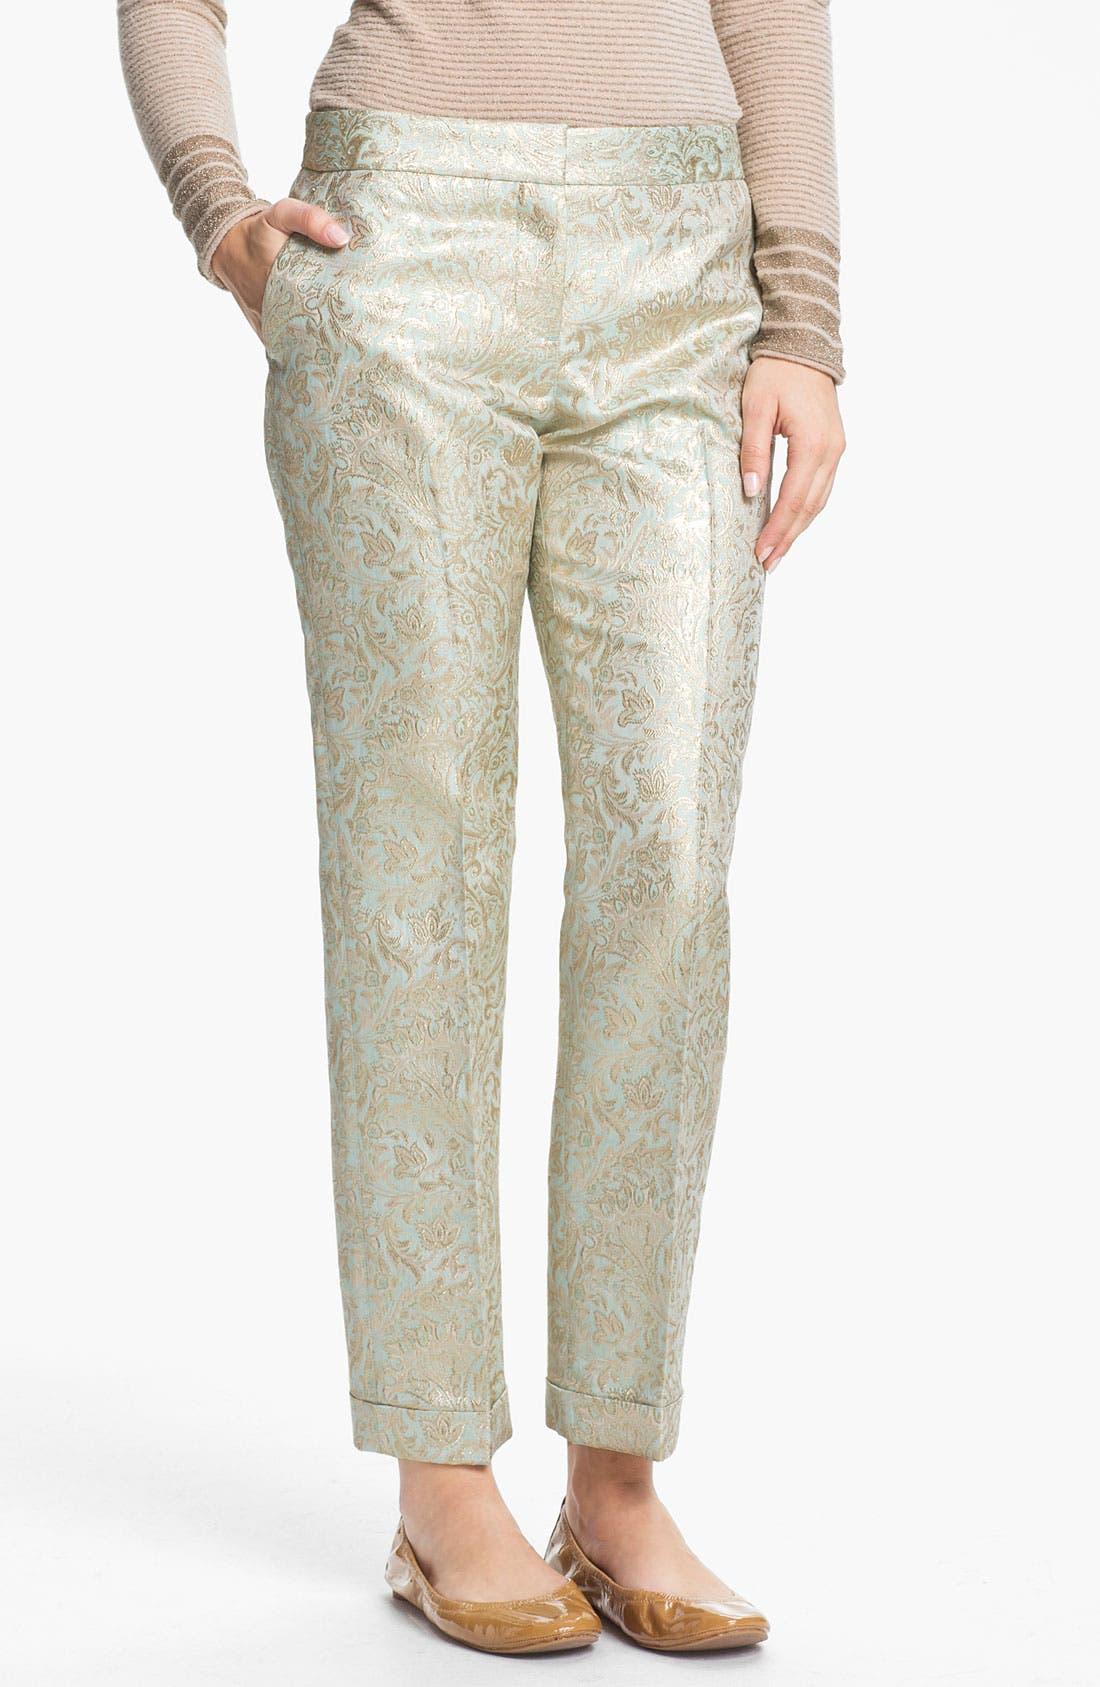 Alternate Image 1 Selected - Tory Burch 'Lola' Metallic Silk Pants